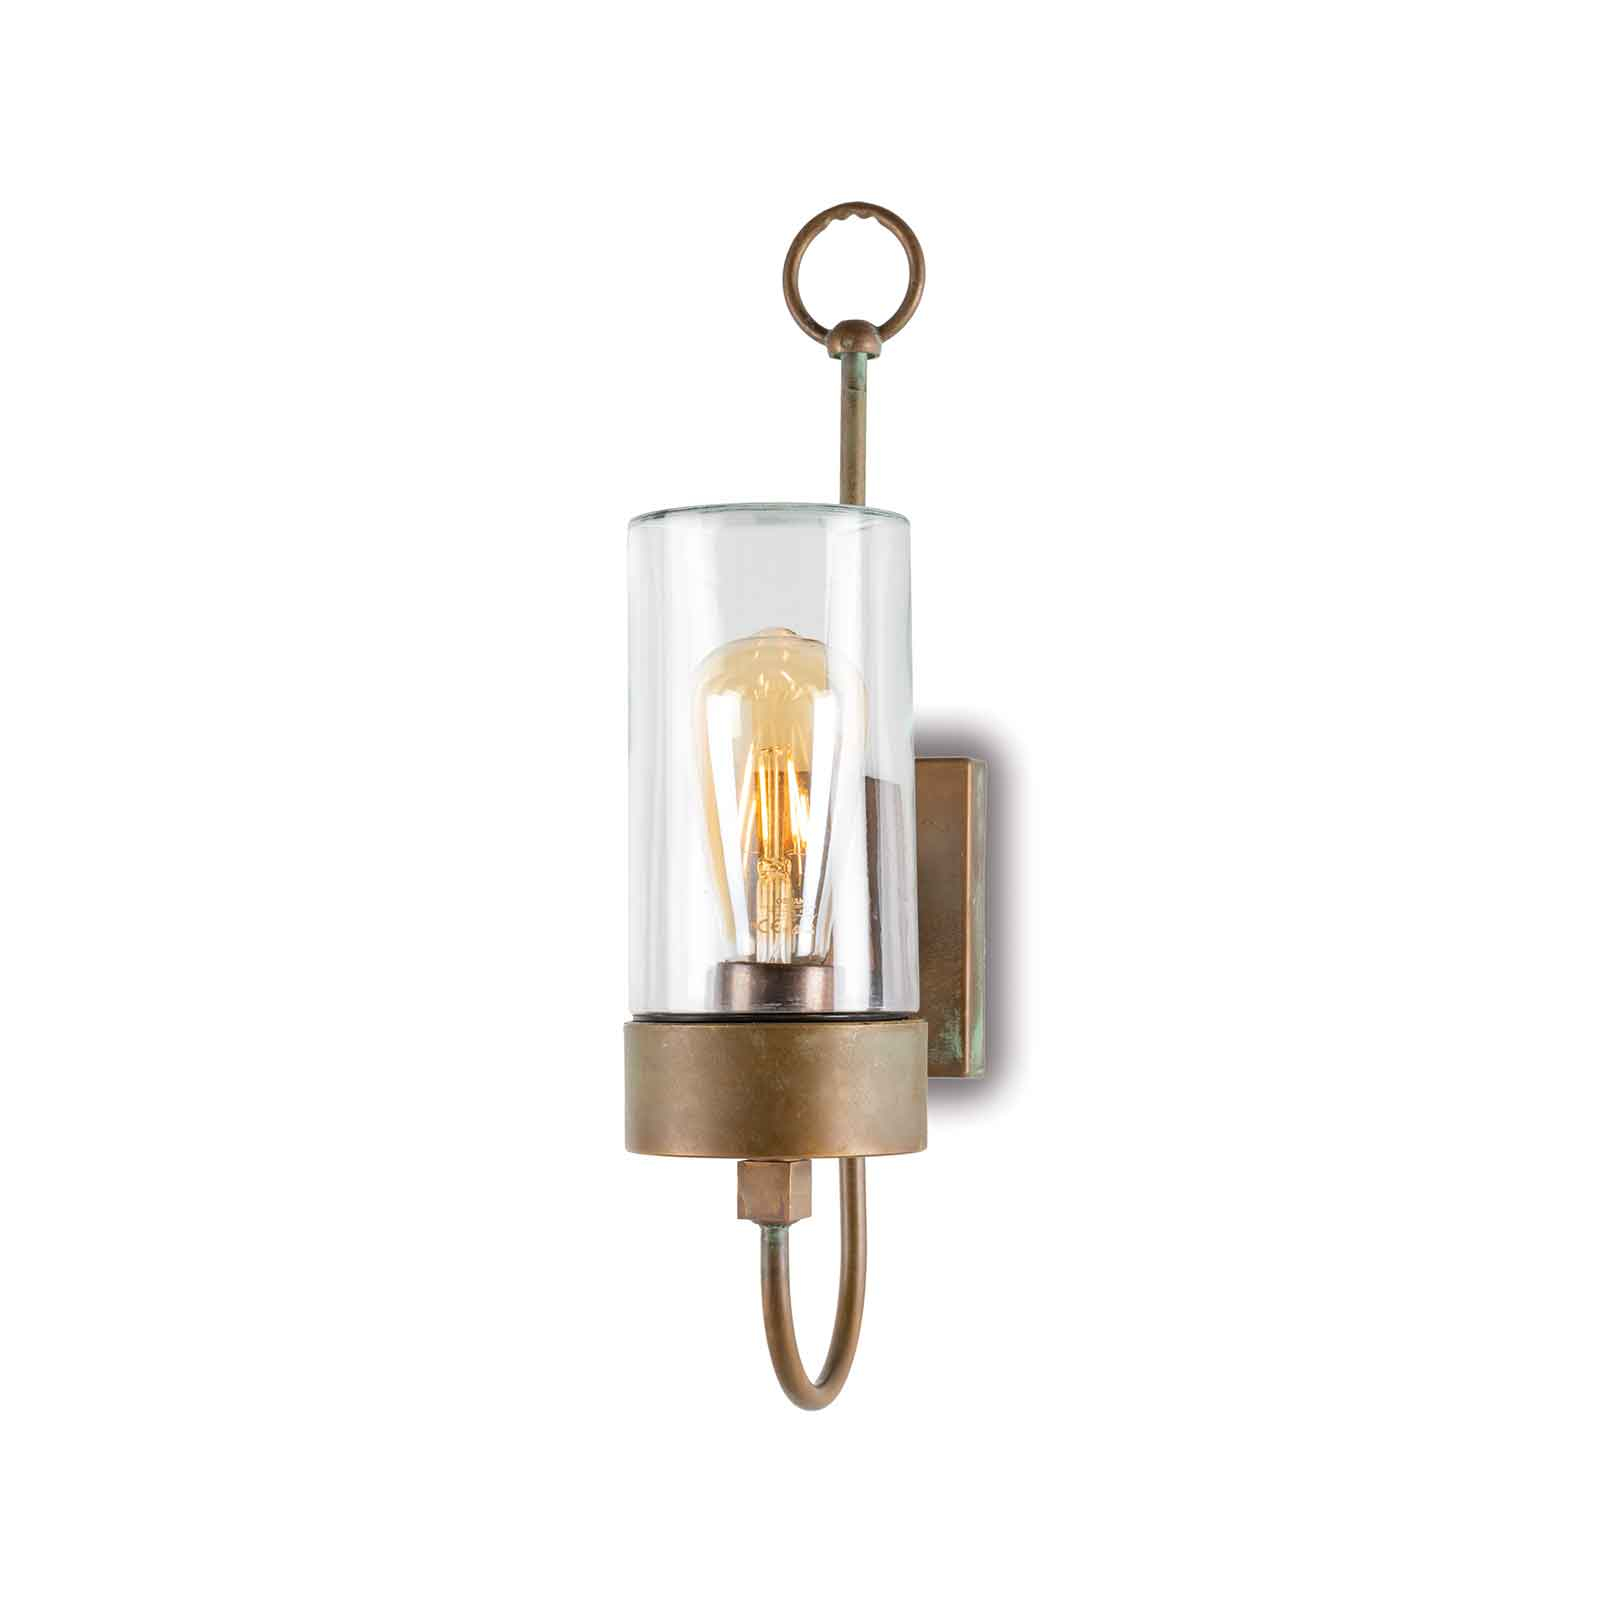 Buitenwandlamp Silindar 3355,messing antiek/helder